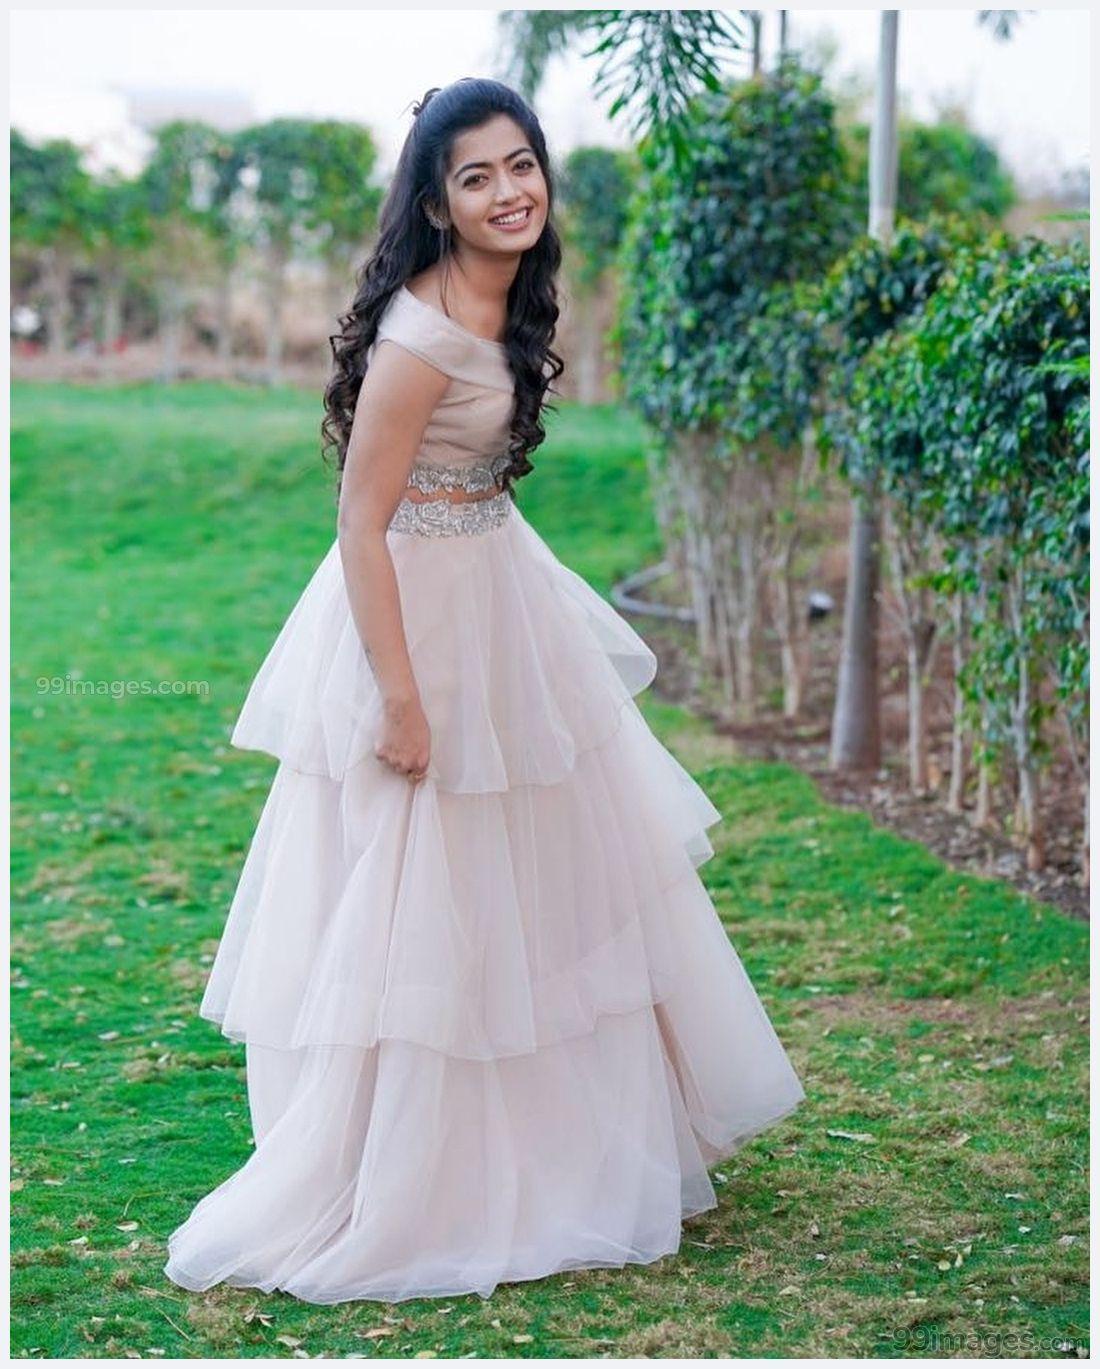 Rashmika Mandanna Beautiful HD Photos & Mobile Wallpapers